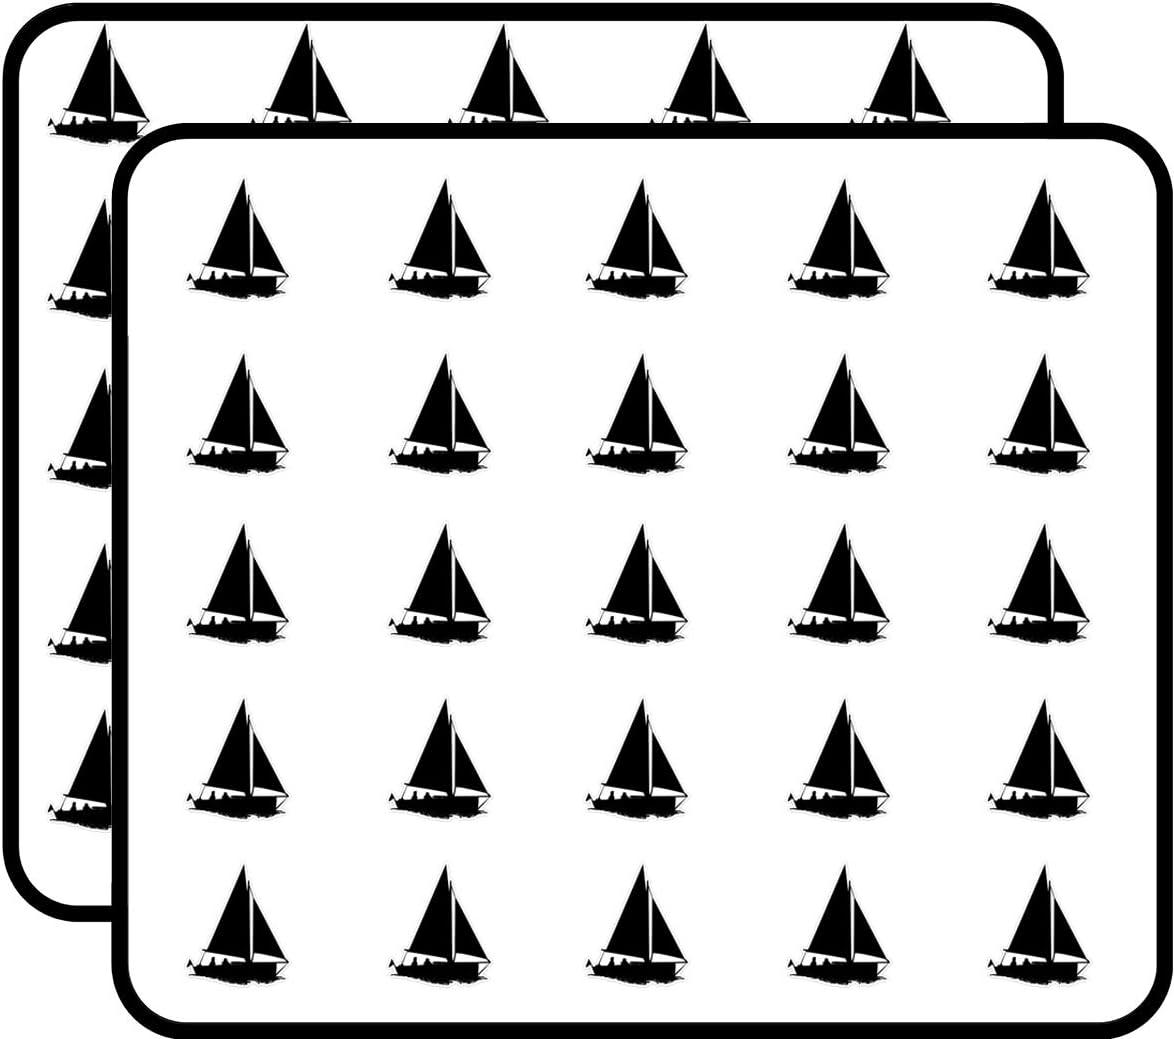 Sailboat Sticker for Scrapbooking, Calendars, Arts, Kids DIY Crafts, Album, Bullet Journals 50 Pack